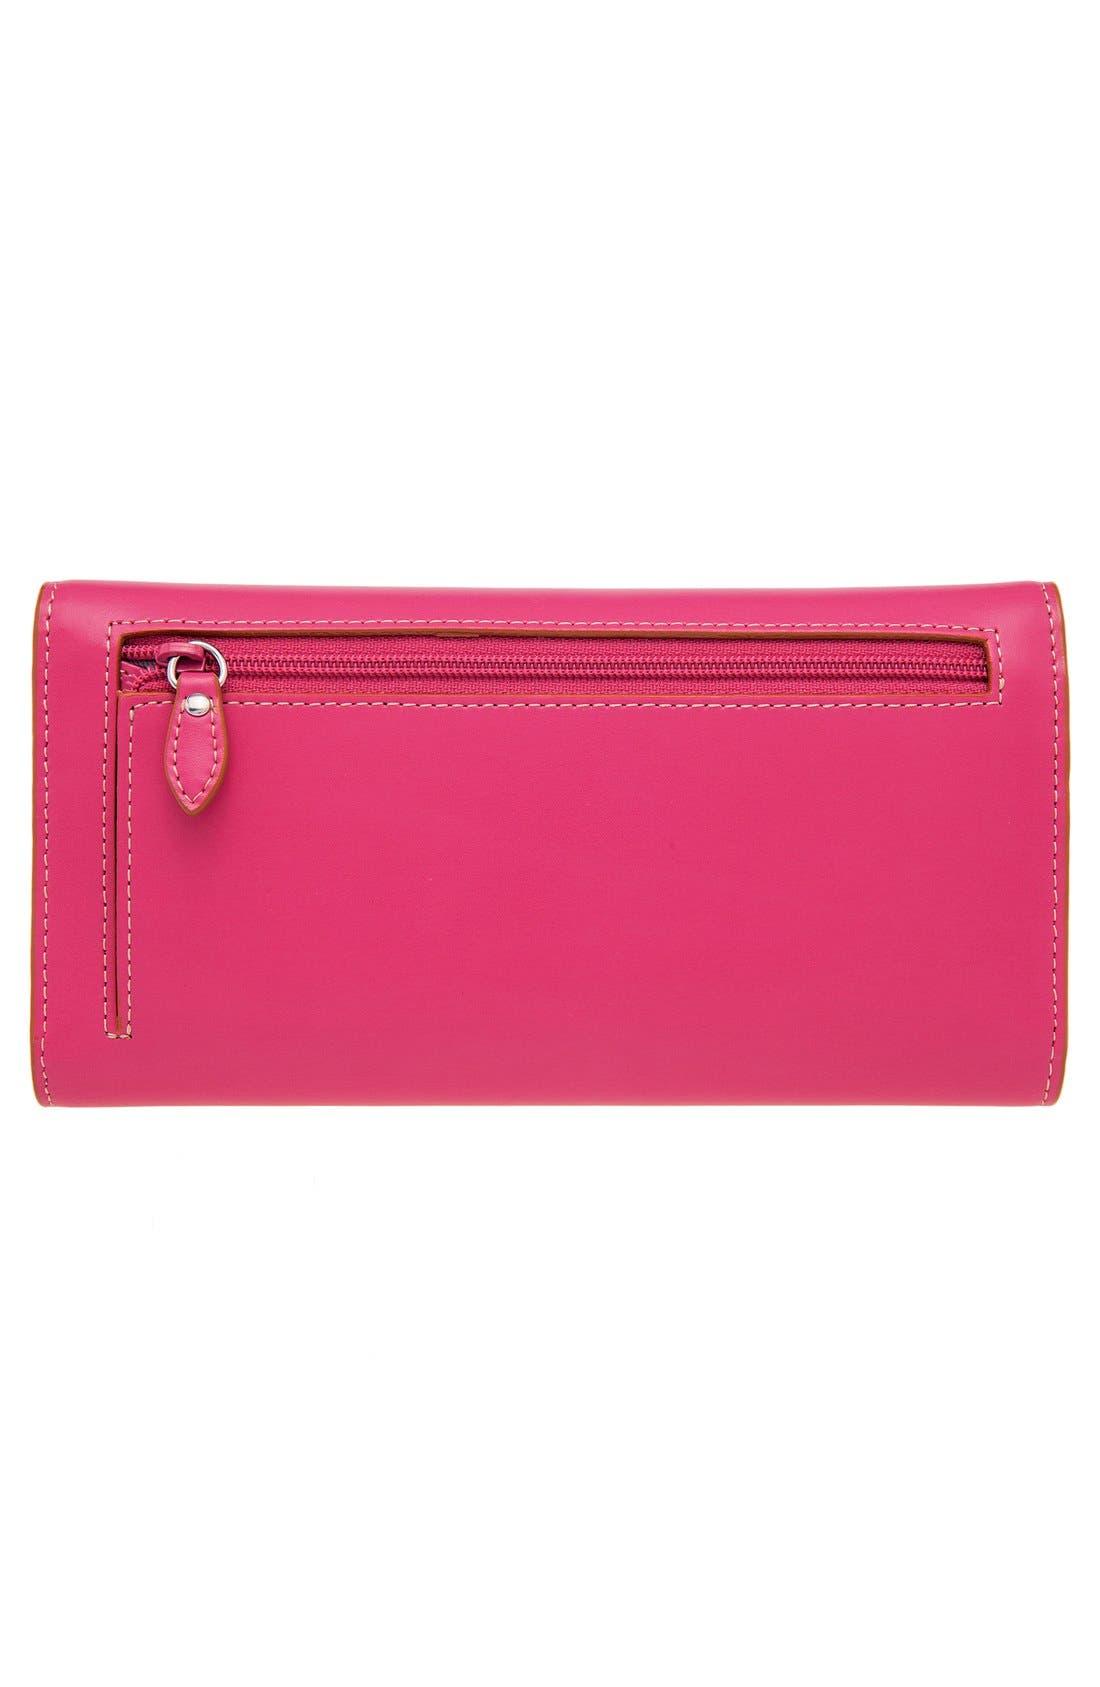 Alternate Image 3  - Lodis 'Audrey' Checkbook Clutch Wallet